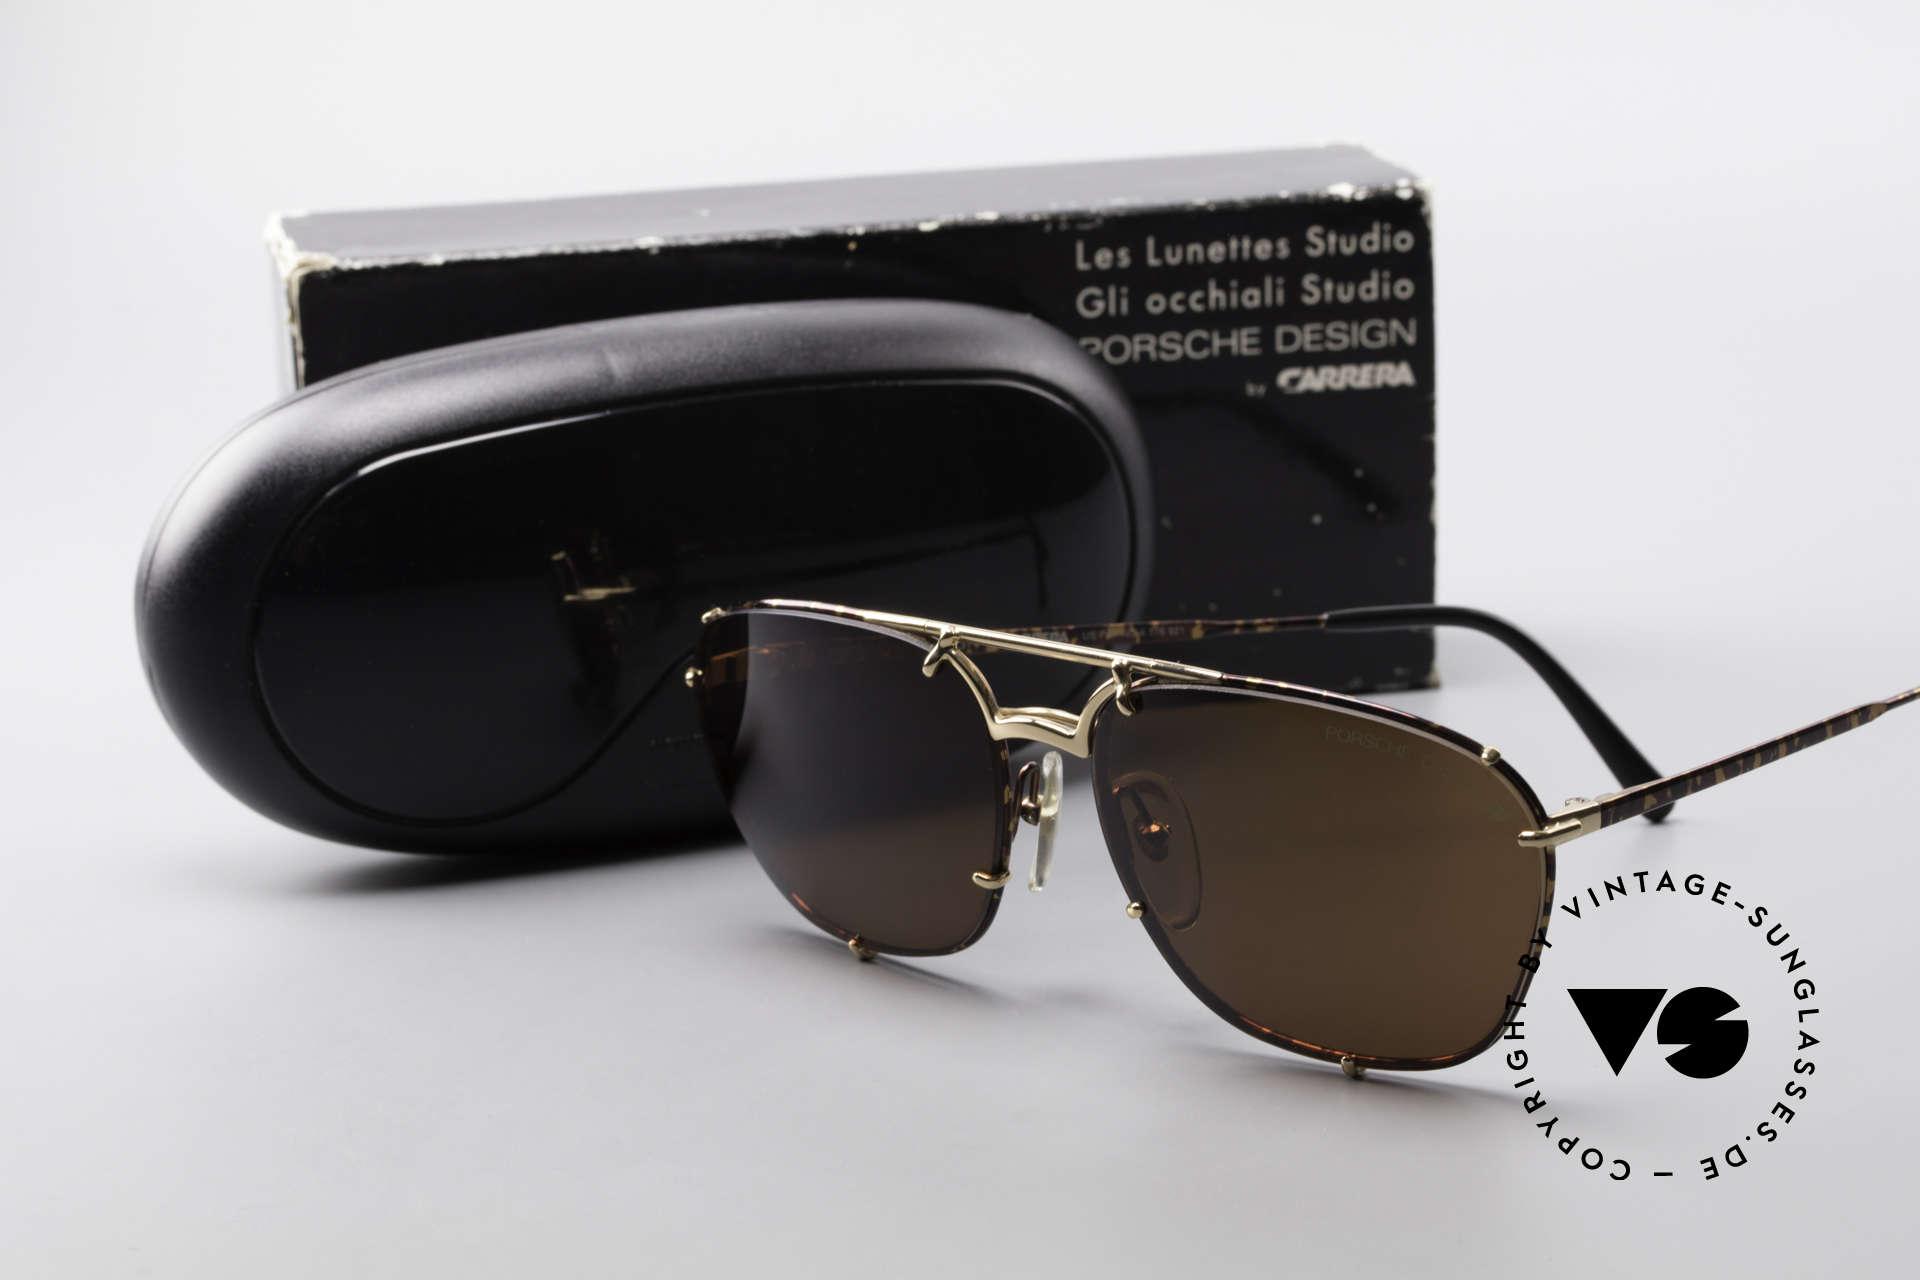 sonnenbrillen porsche 5647 herren vintage sonnenbrille vintage sunglasses. Black Bedroom Furniture Sets. Home Design Ideas